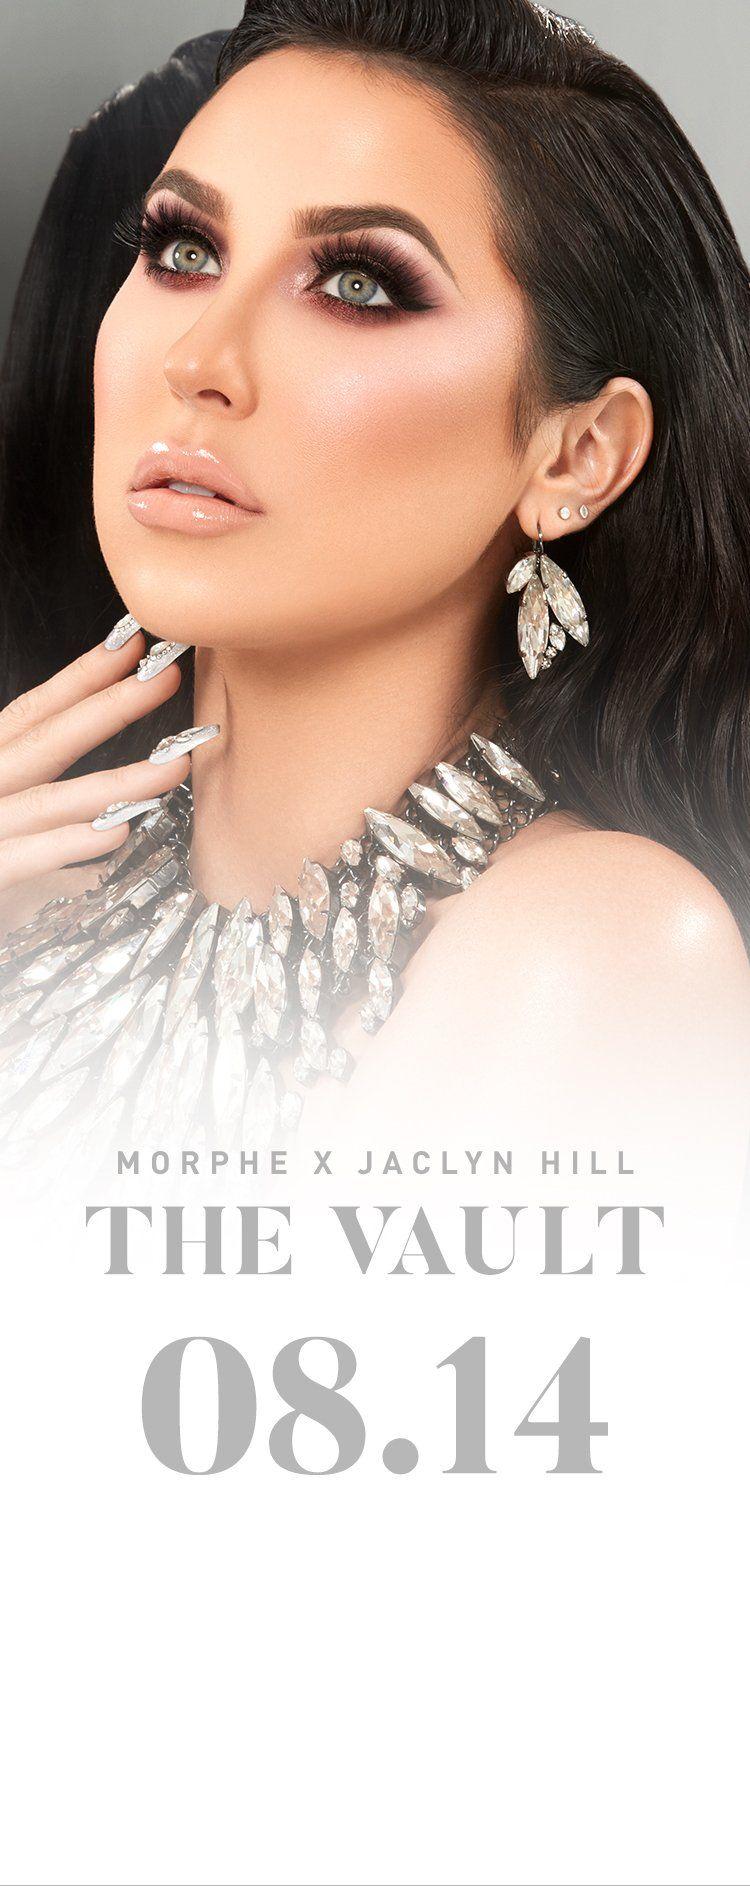 Jaclyn Hill Vault Morphe eyeshadow palette, Morphe